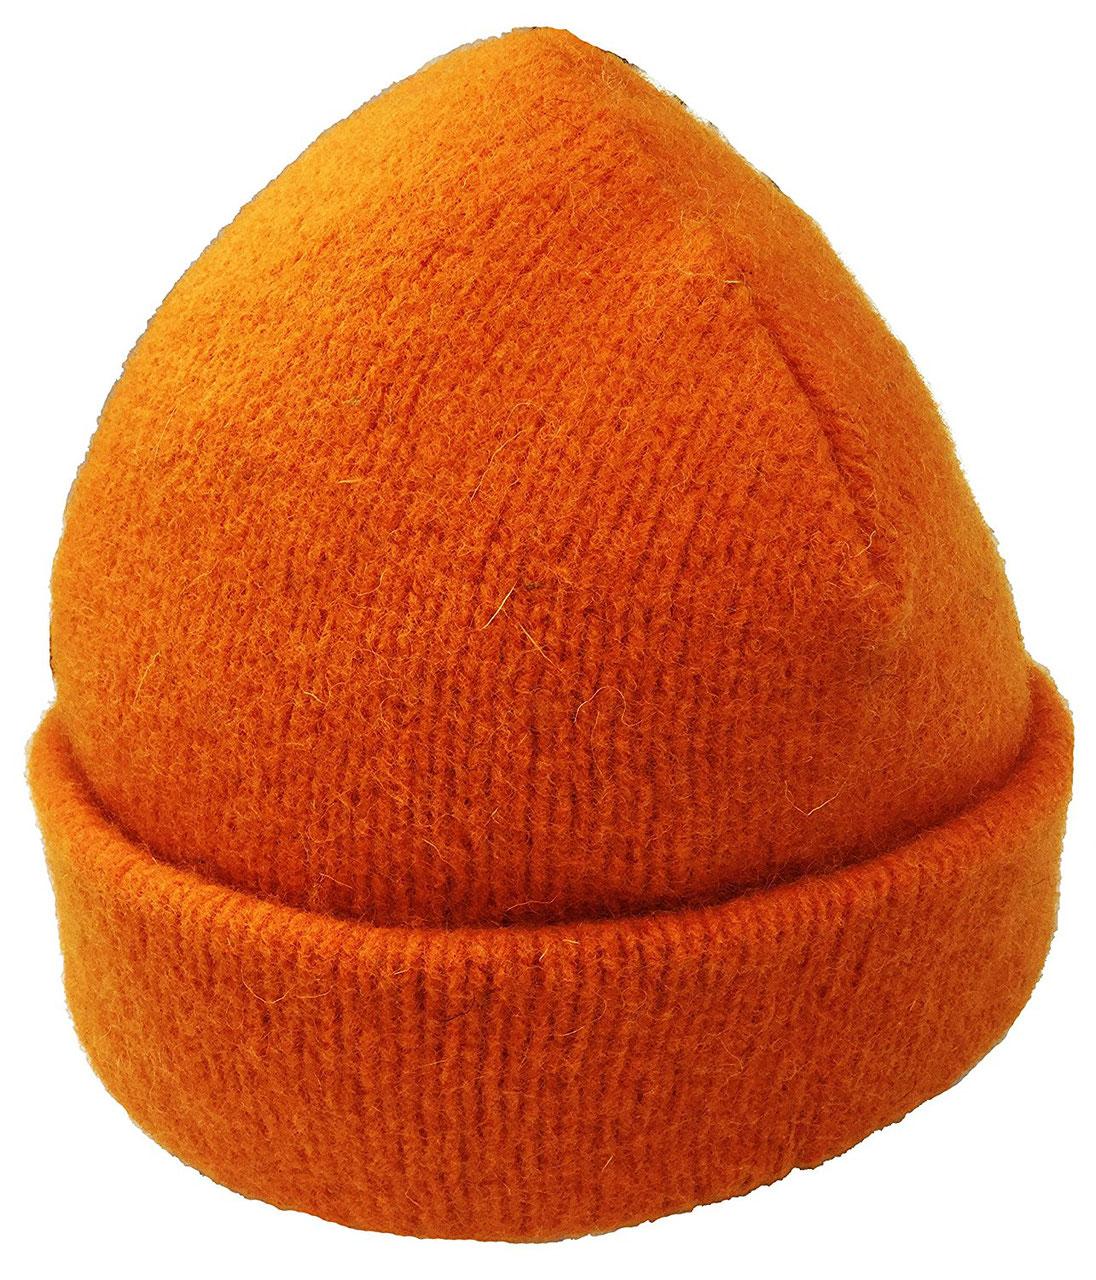 8da128f93b3 Dachstein Woolwear Warm Wool Hat - Sweater Chalet